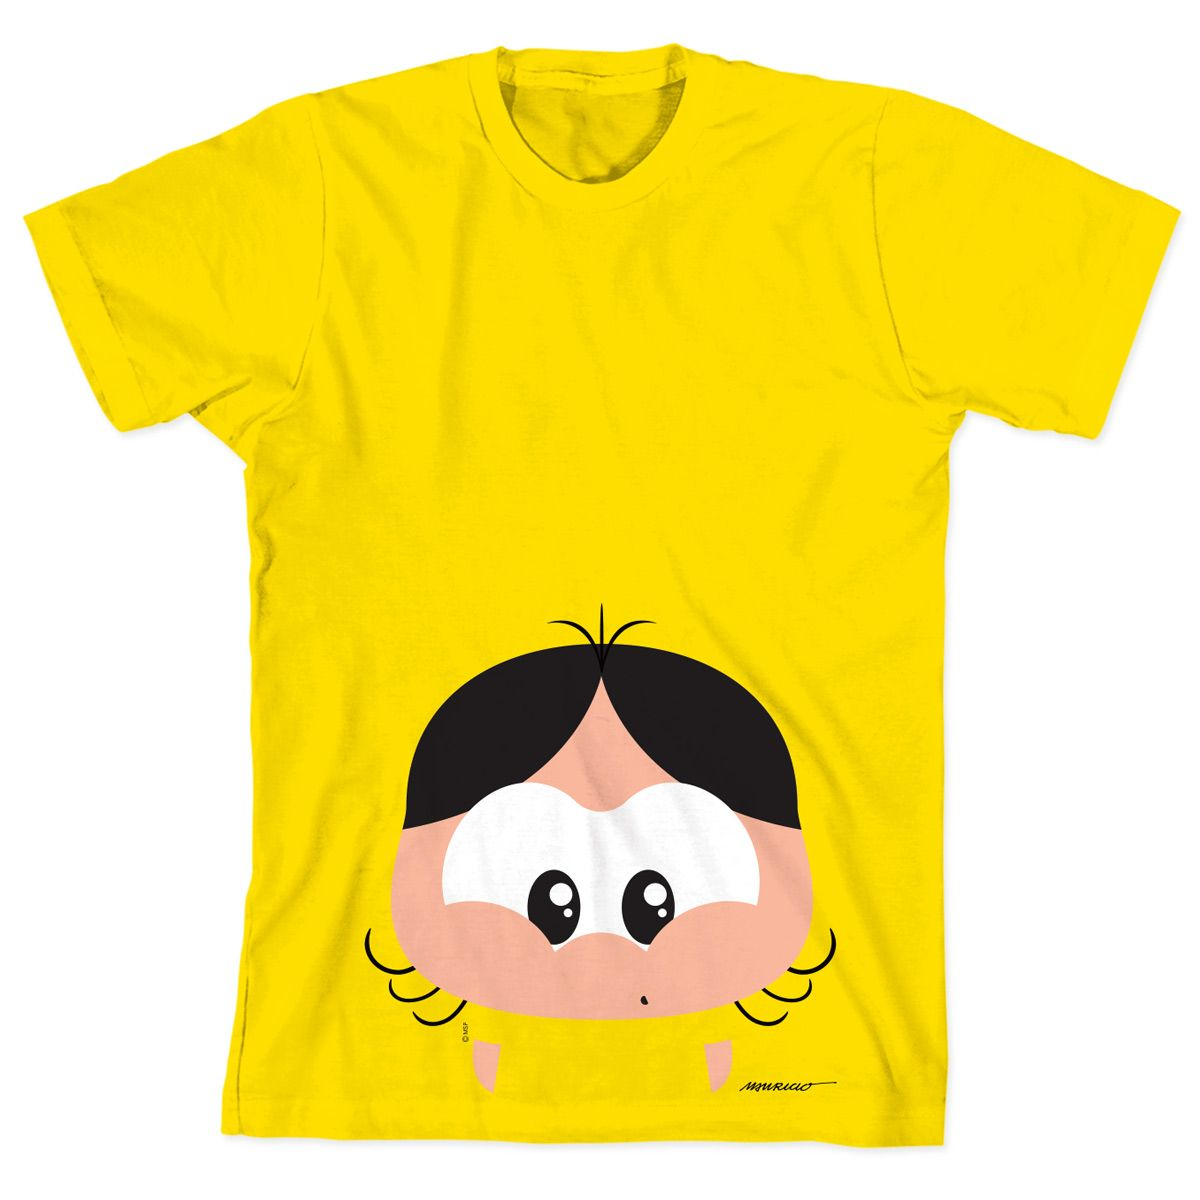 89ef106c4 Camiseta Turma da Mônica Toy - Big Magali